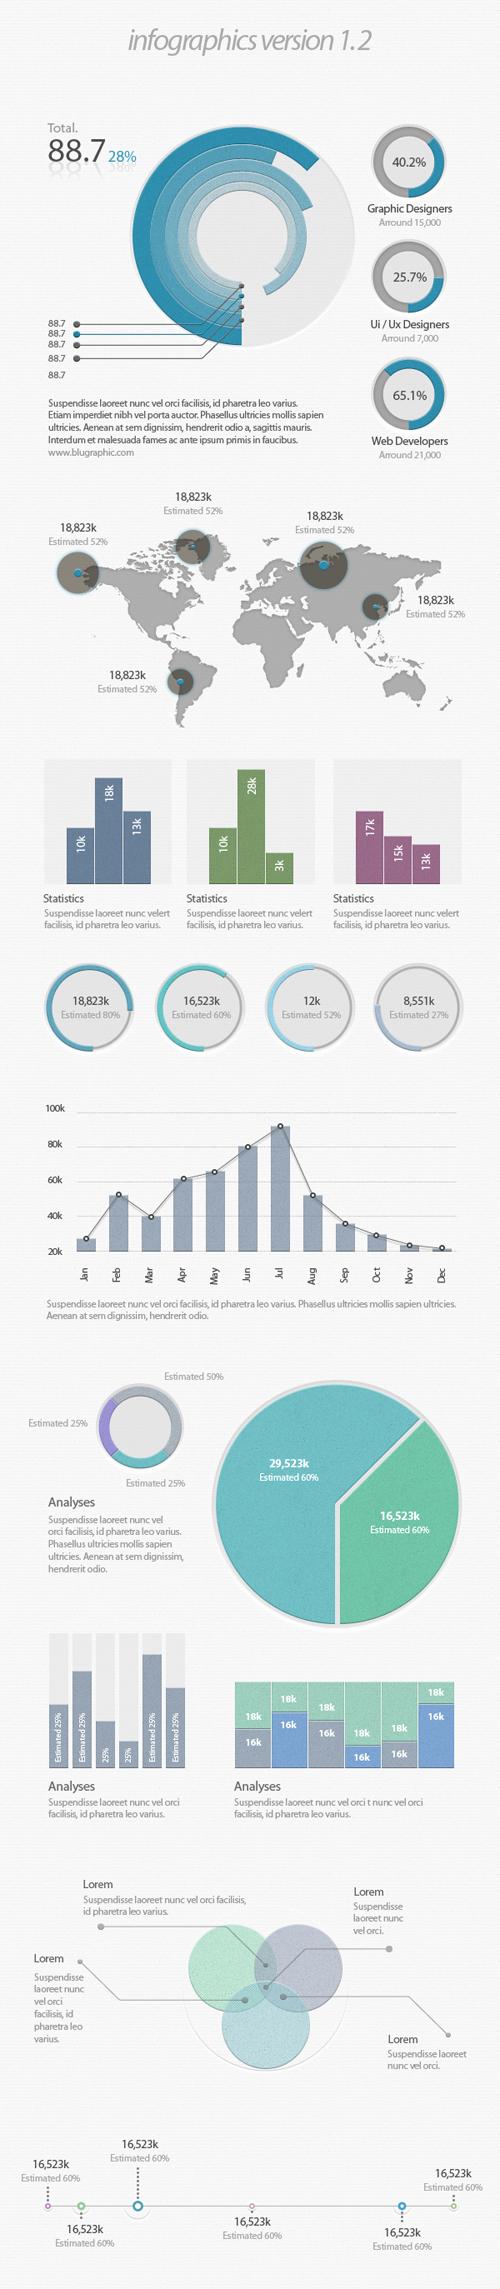 Infographic UI Vector Elements - 30